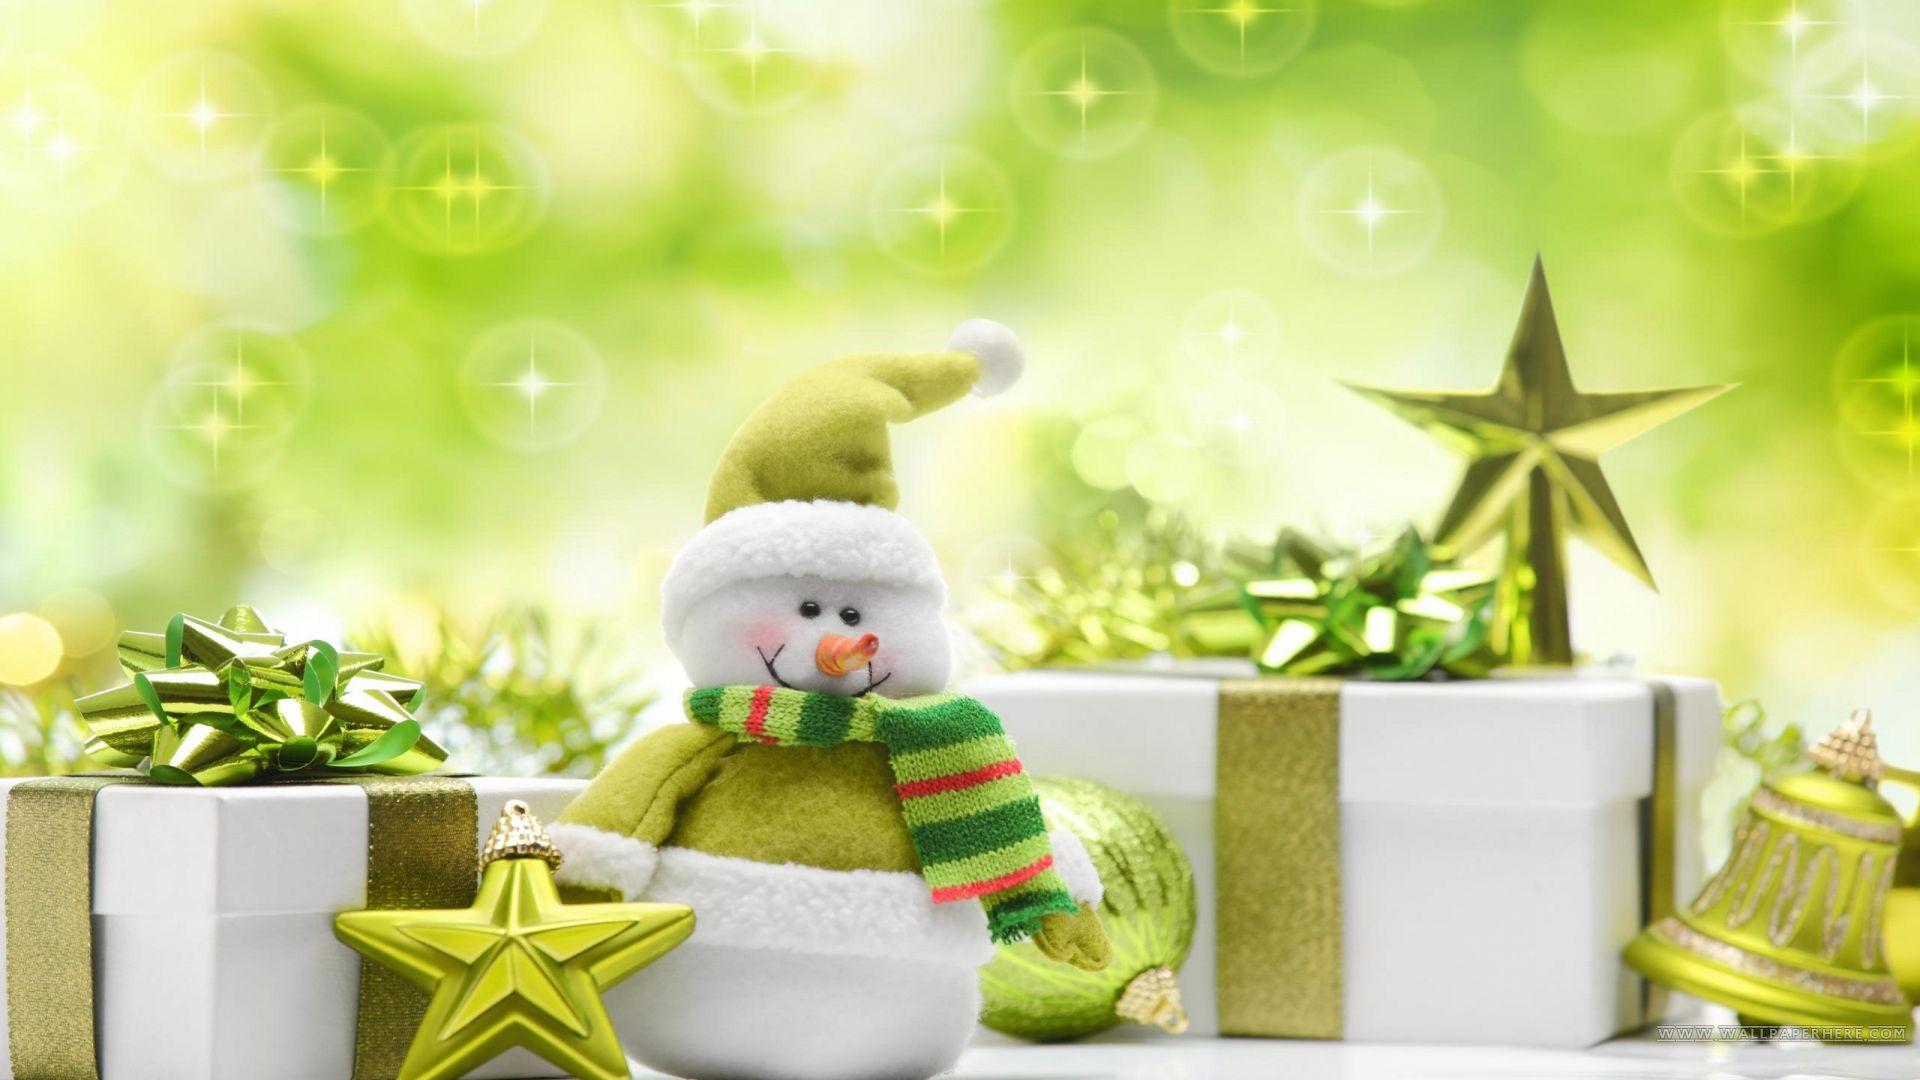 Holidays HD Wallpaper 08